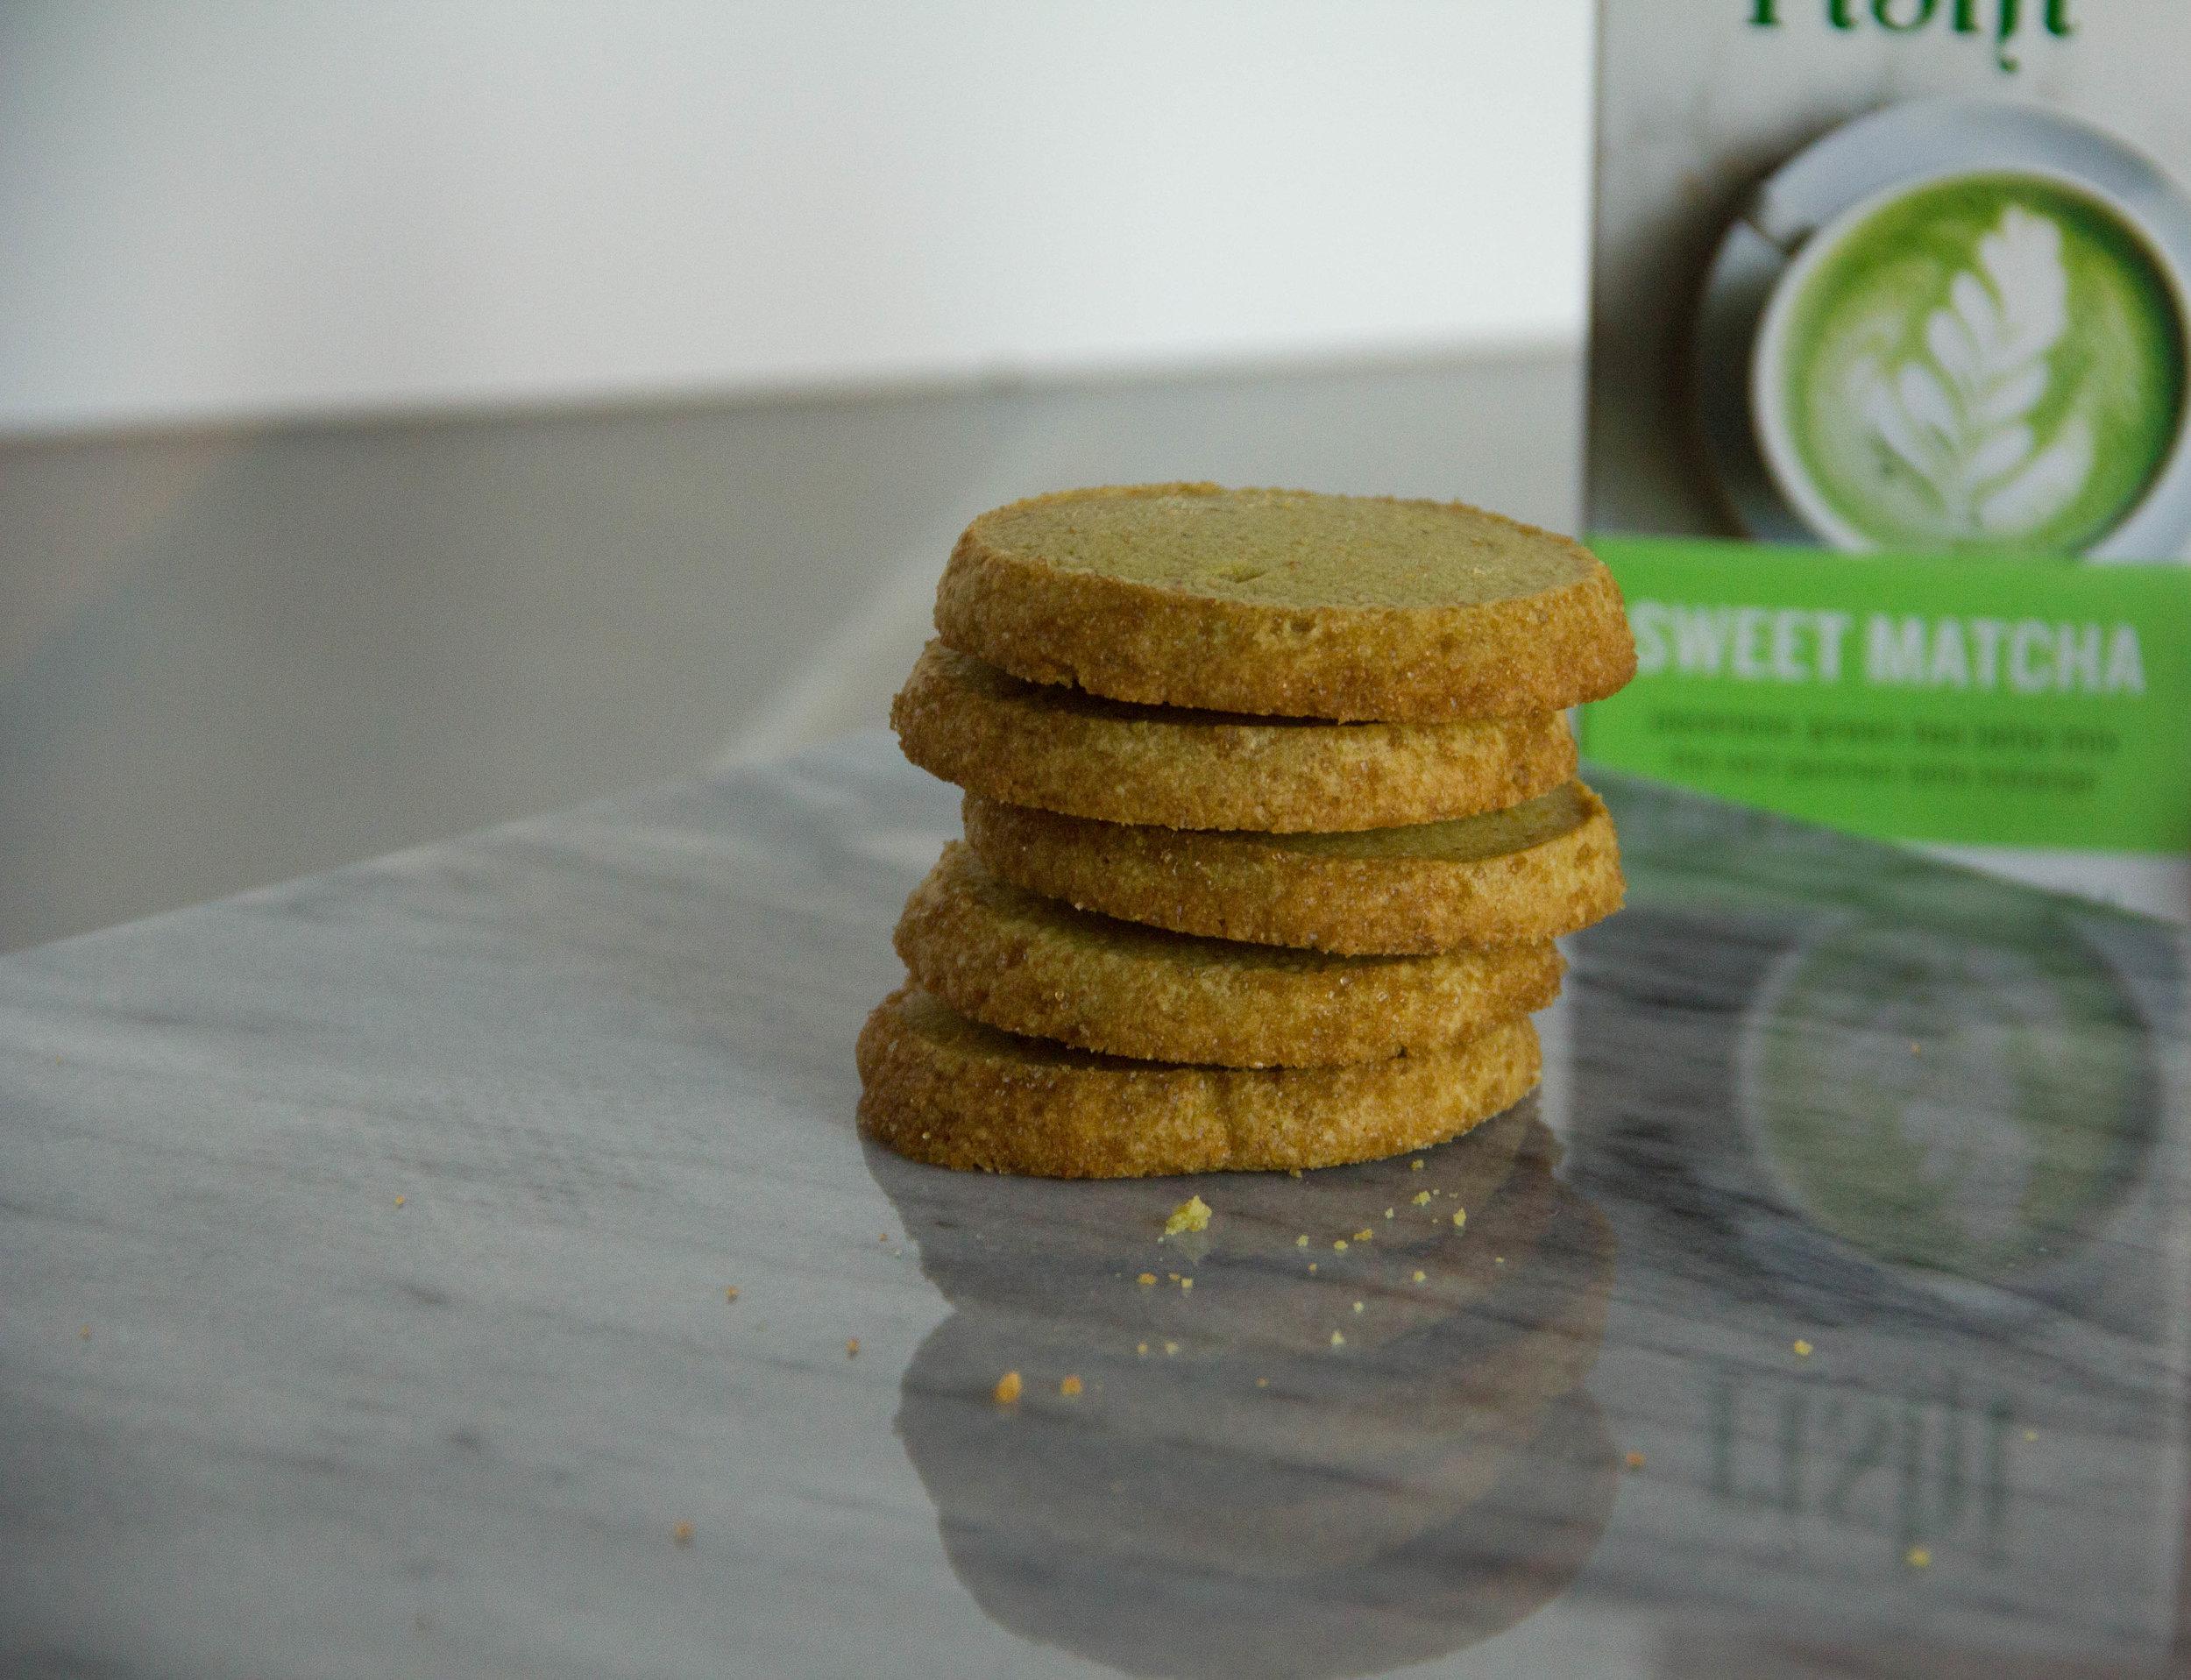 Match Pistachio Shortbread Cookie Recipe 3.jpg